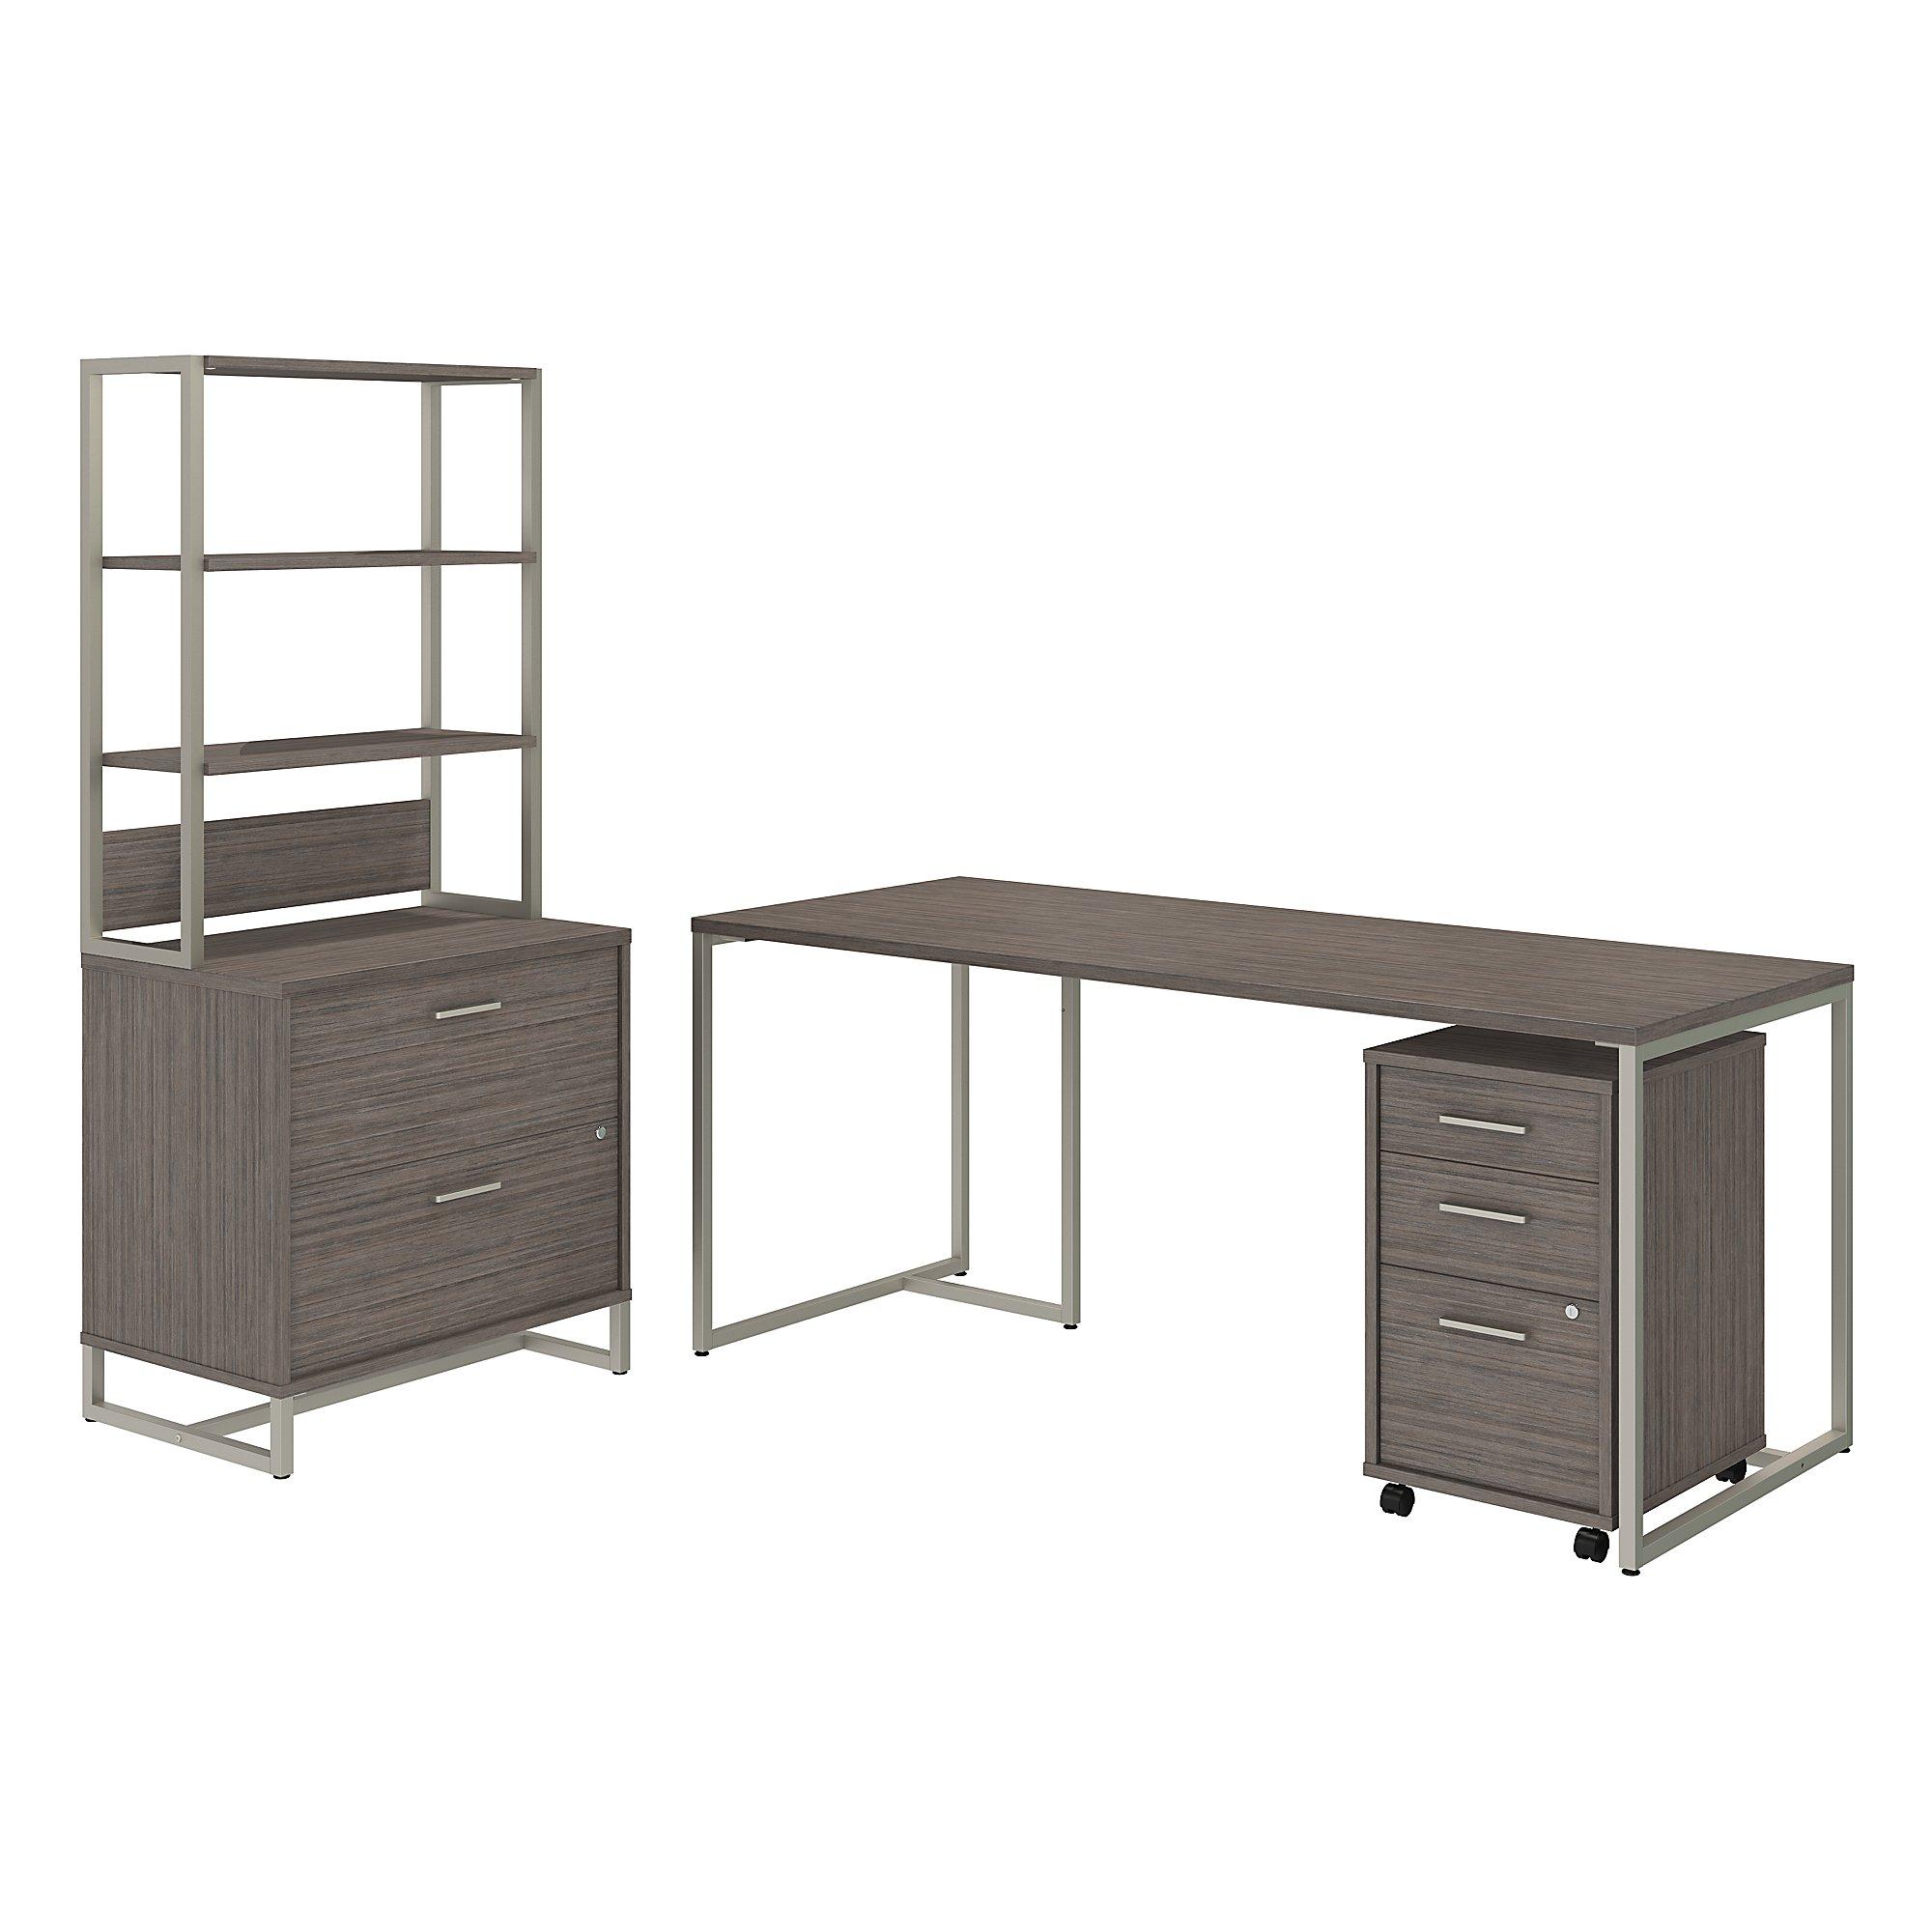 kathy ireland method office furniture set in cocoa